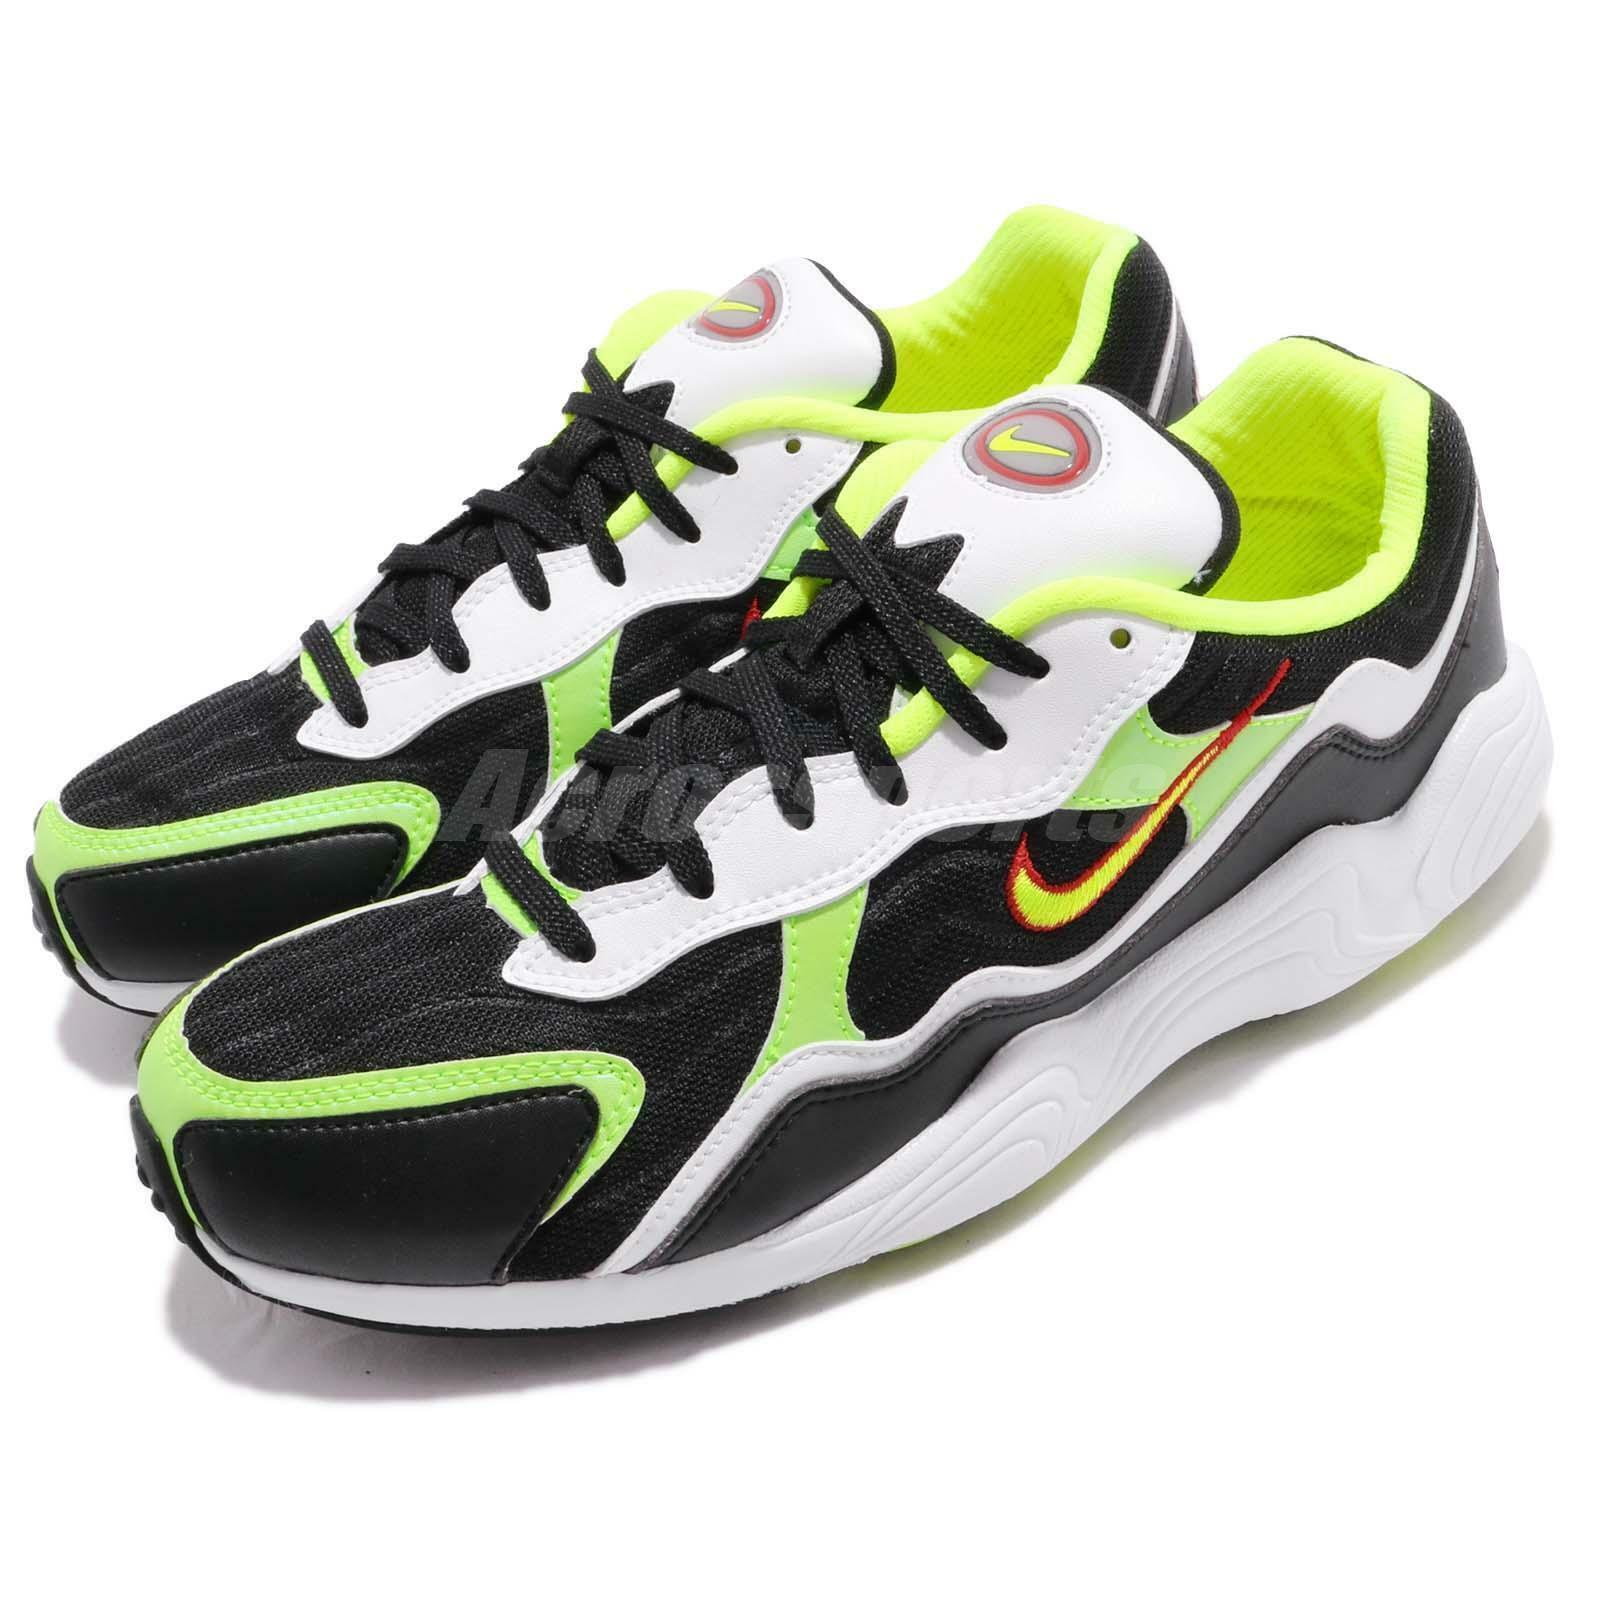 Nike Air Zoom Alpha Black Volt Mens Retro Running shoes BQ8800-003